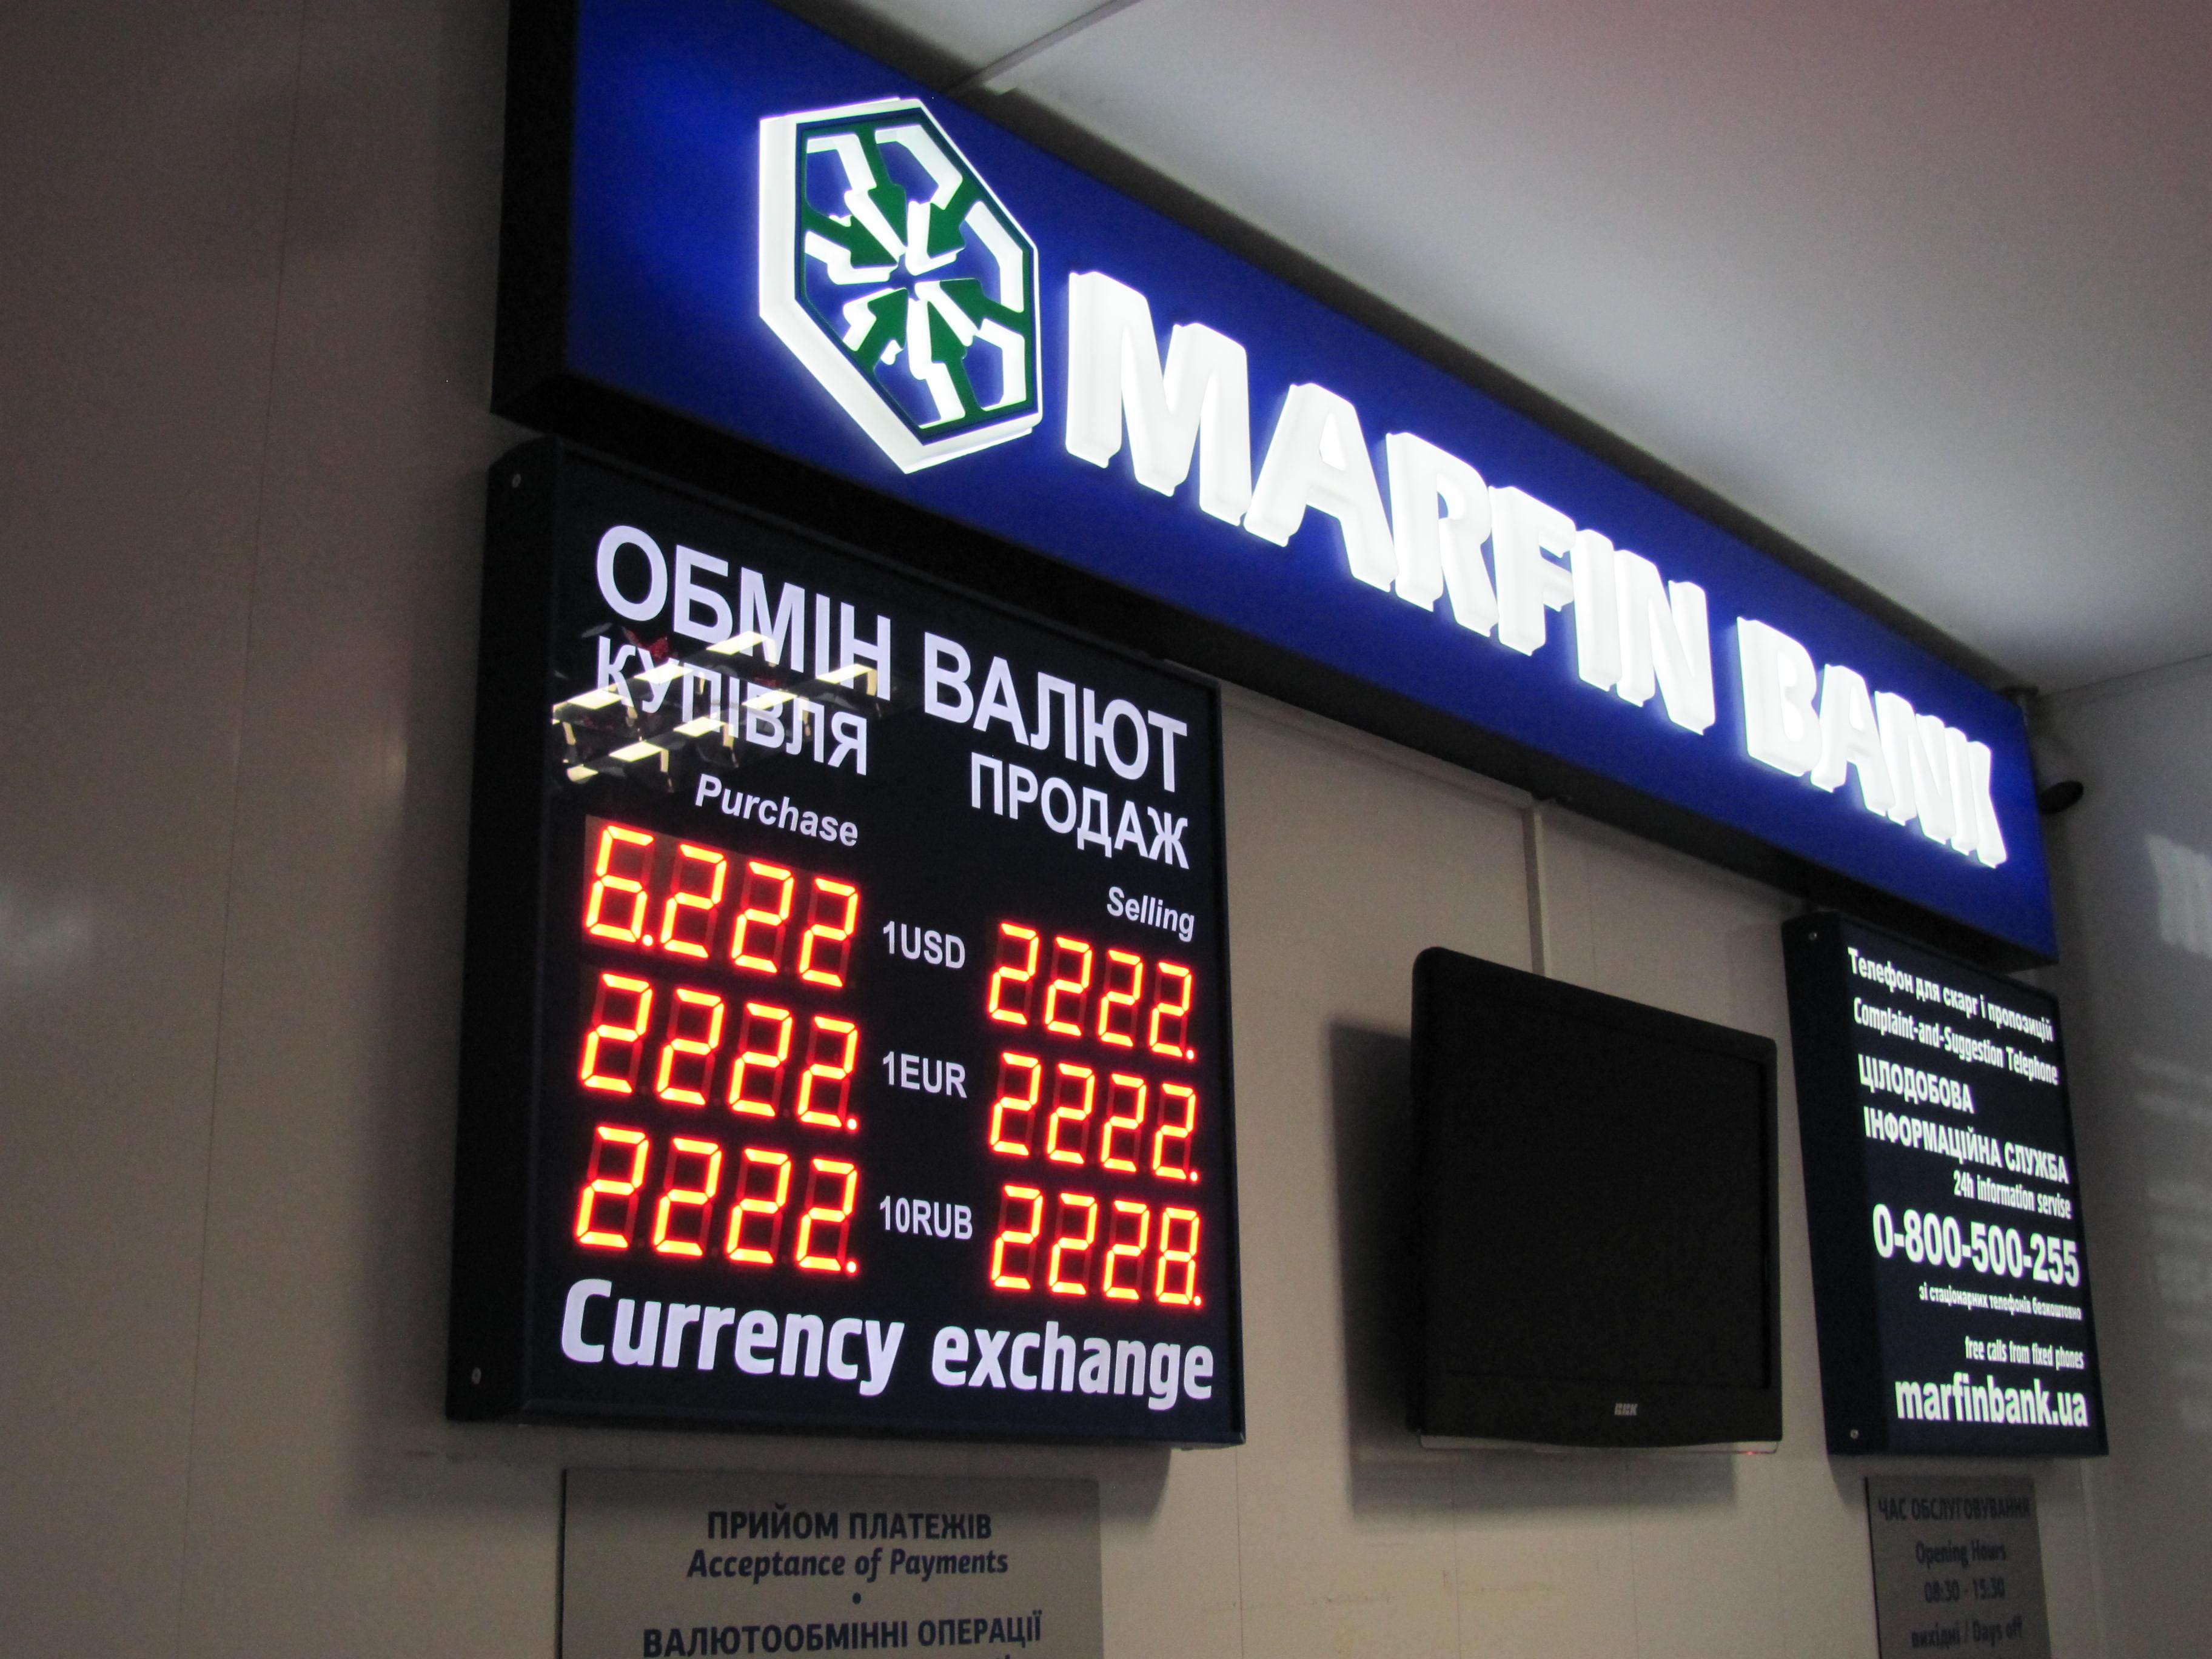 Электронное табло обмена валют, четырехзначные сегмент-цифры, 3 вида валют, смена курса.